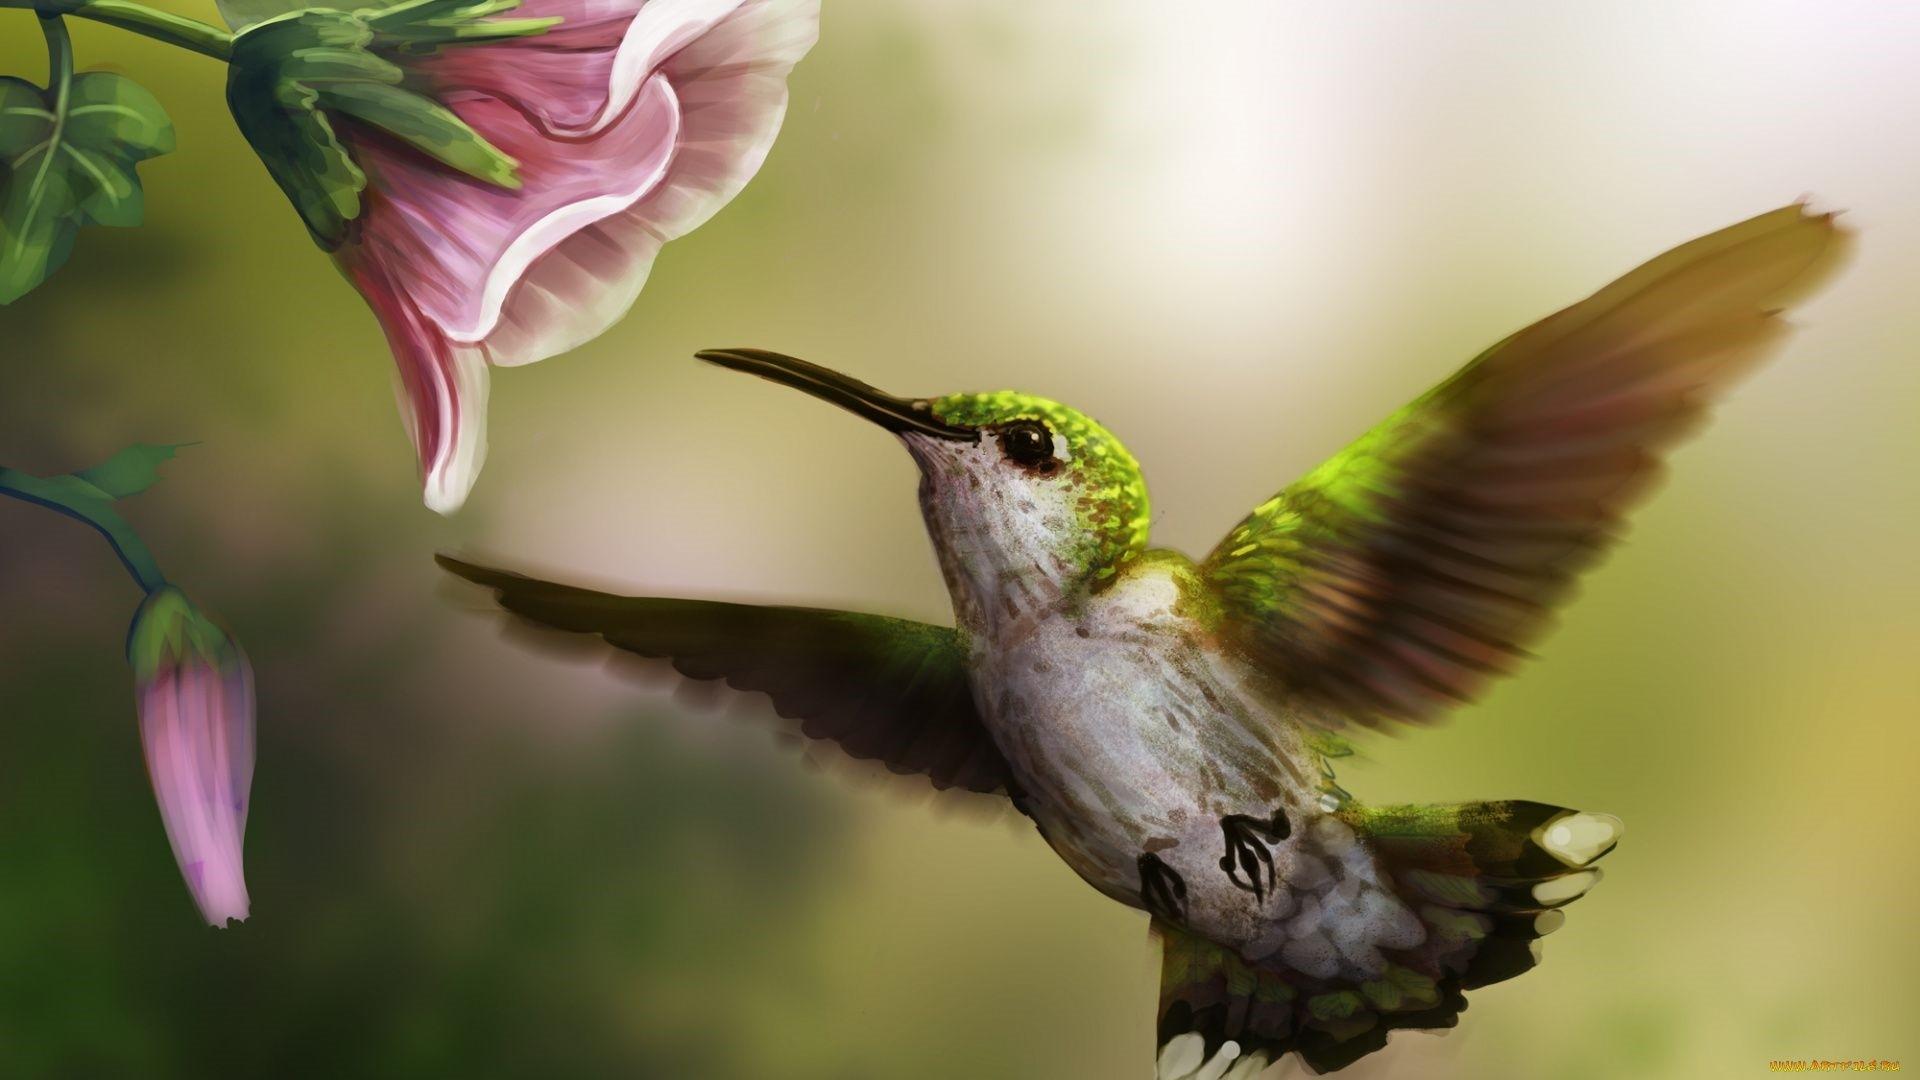 Hummingbird Wallpaper and Background